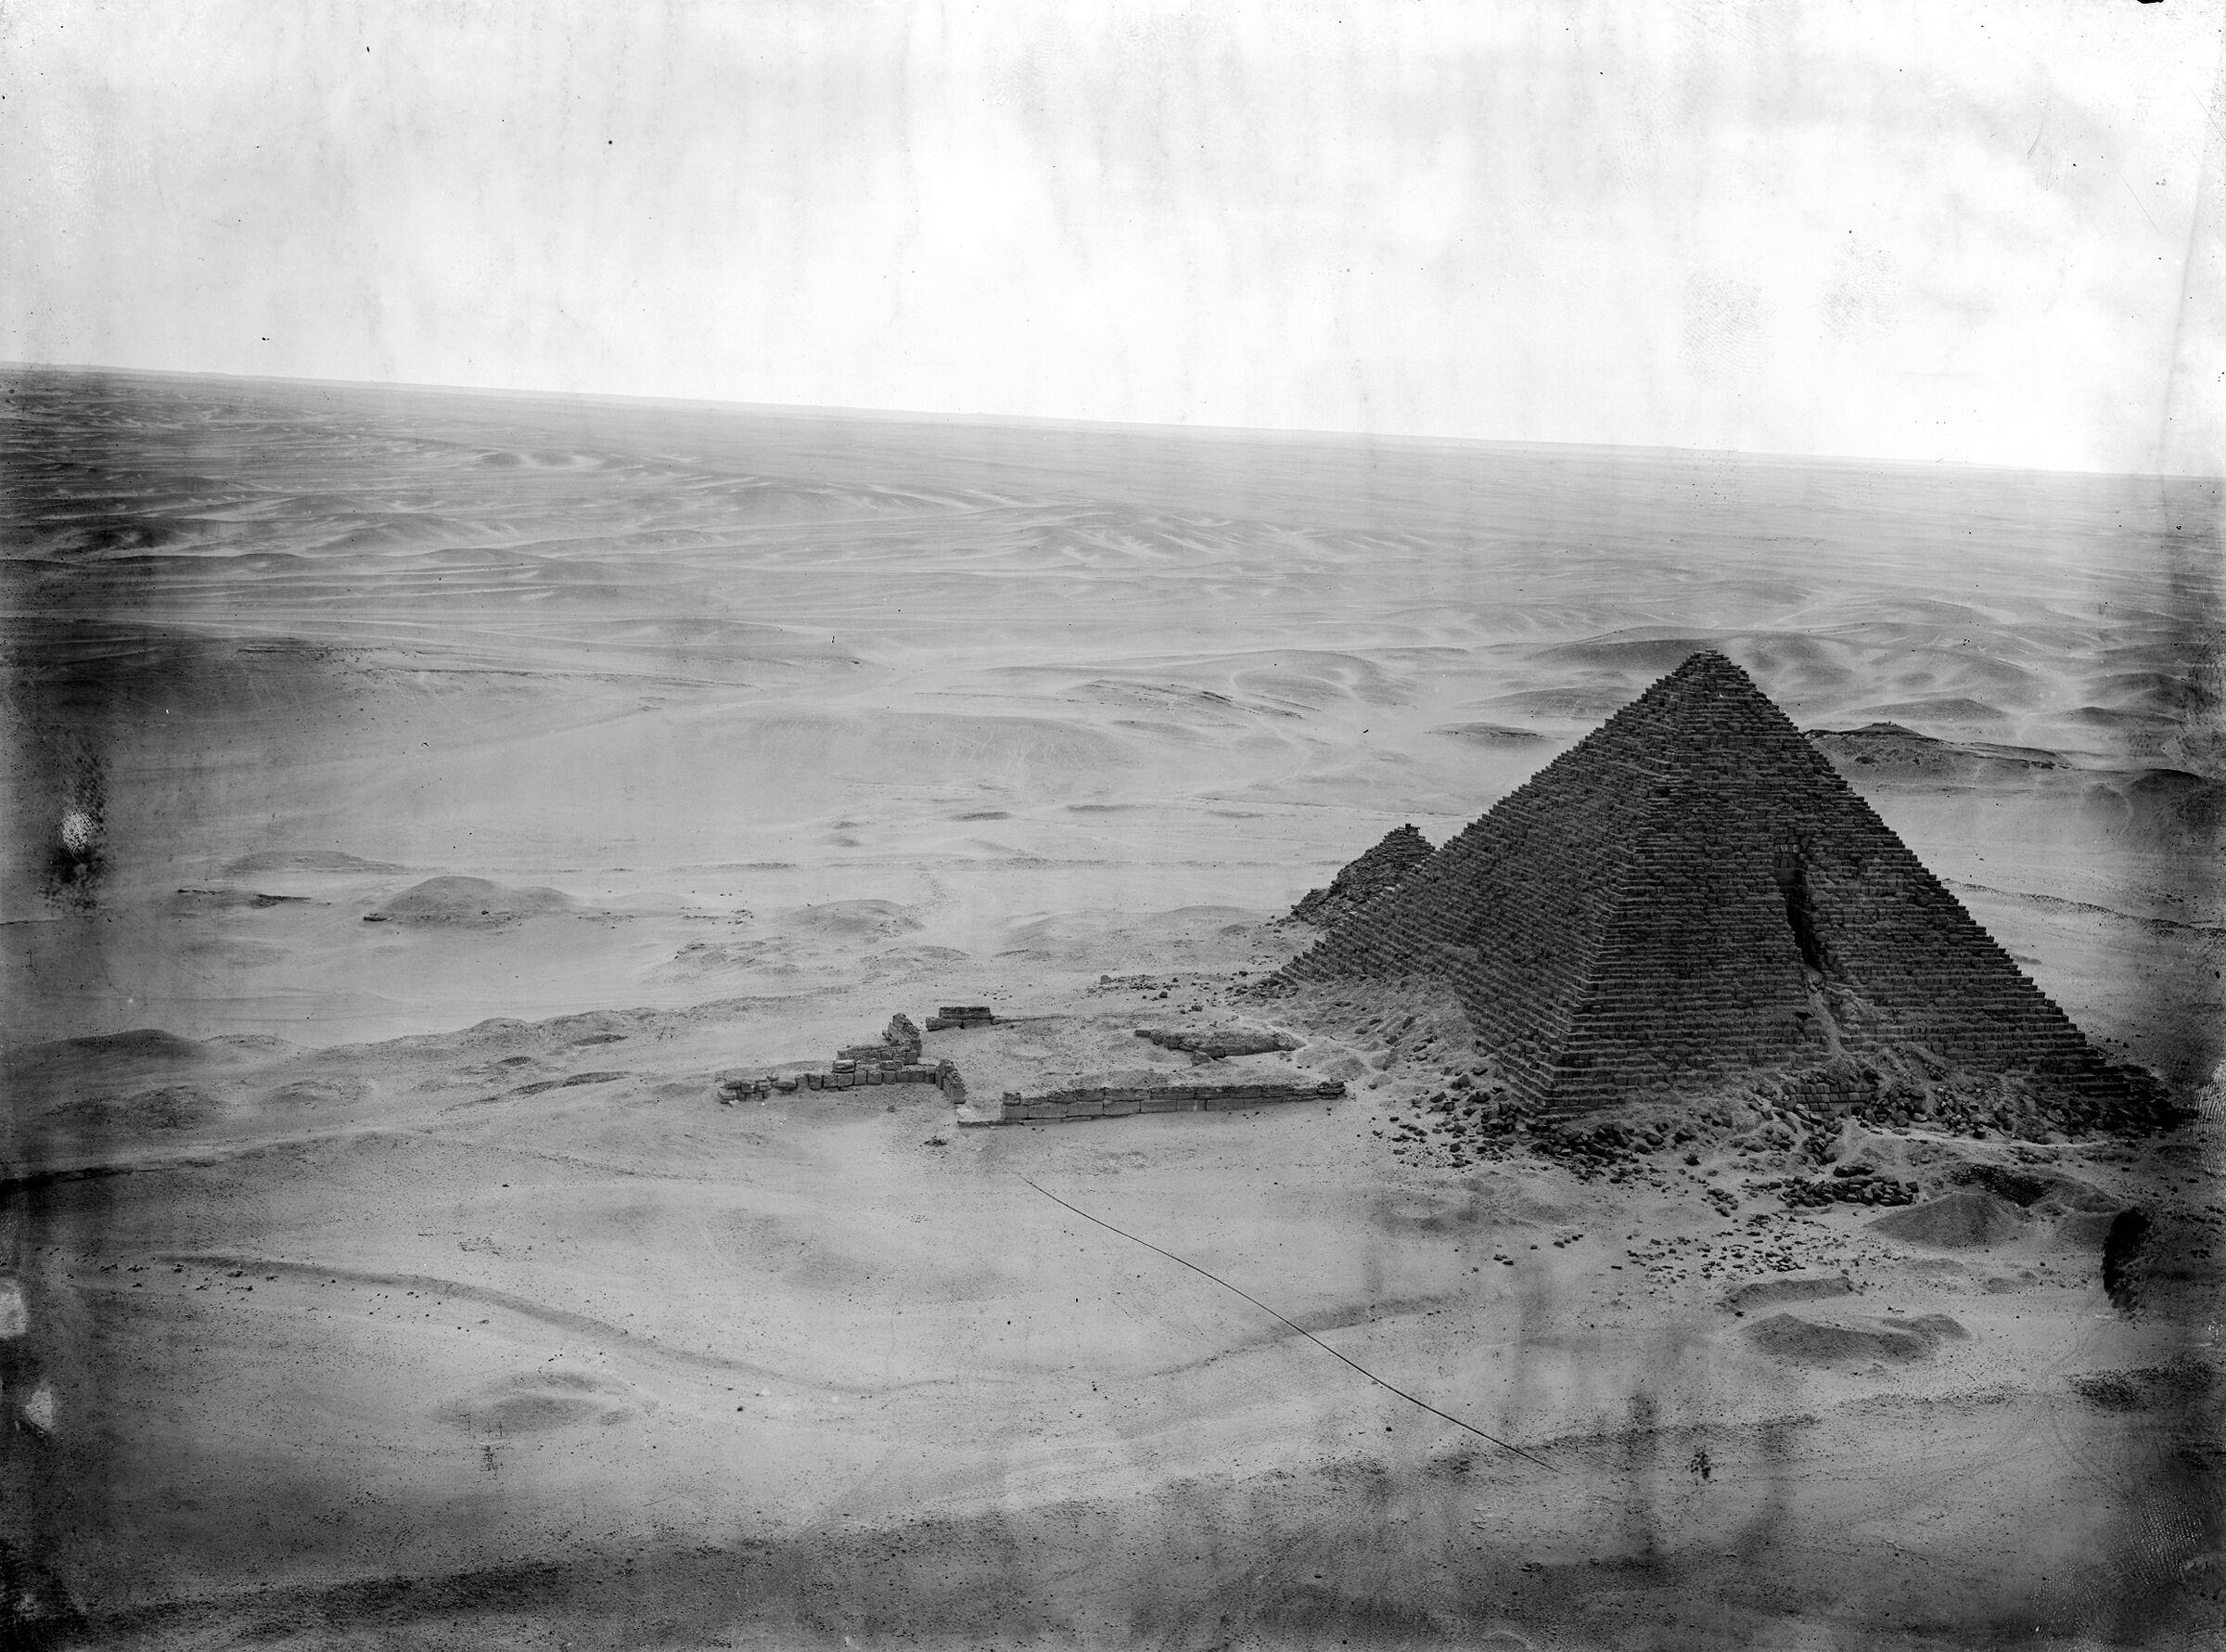 Menkaure Pyramid Complex: Site: Giza; View: Menkaure Pyramid, Menkaure pyramid temple